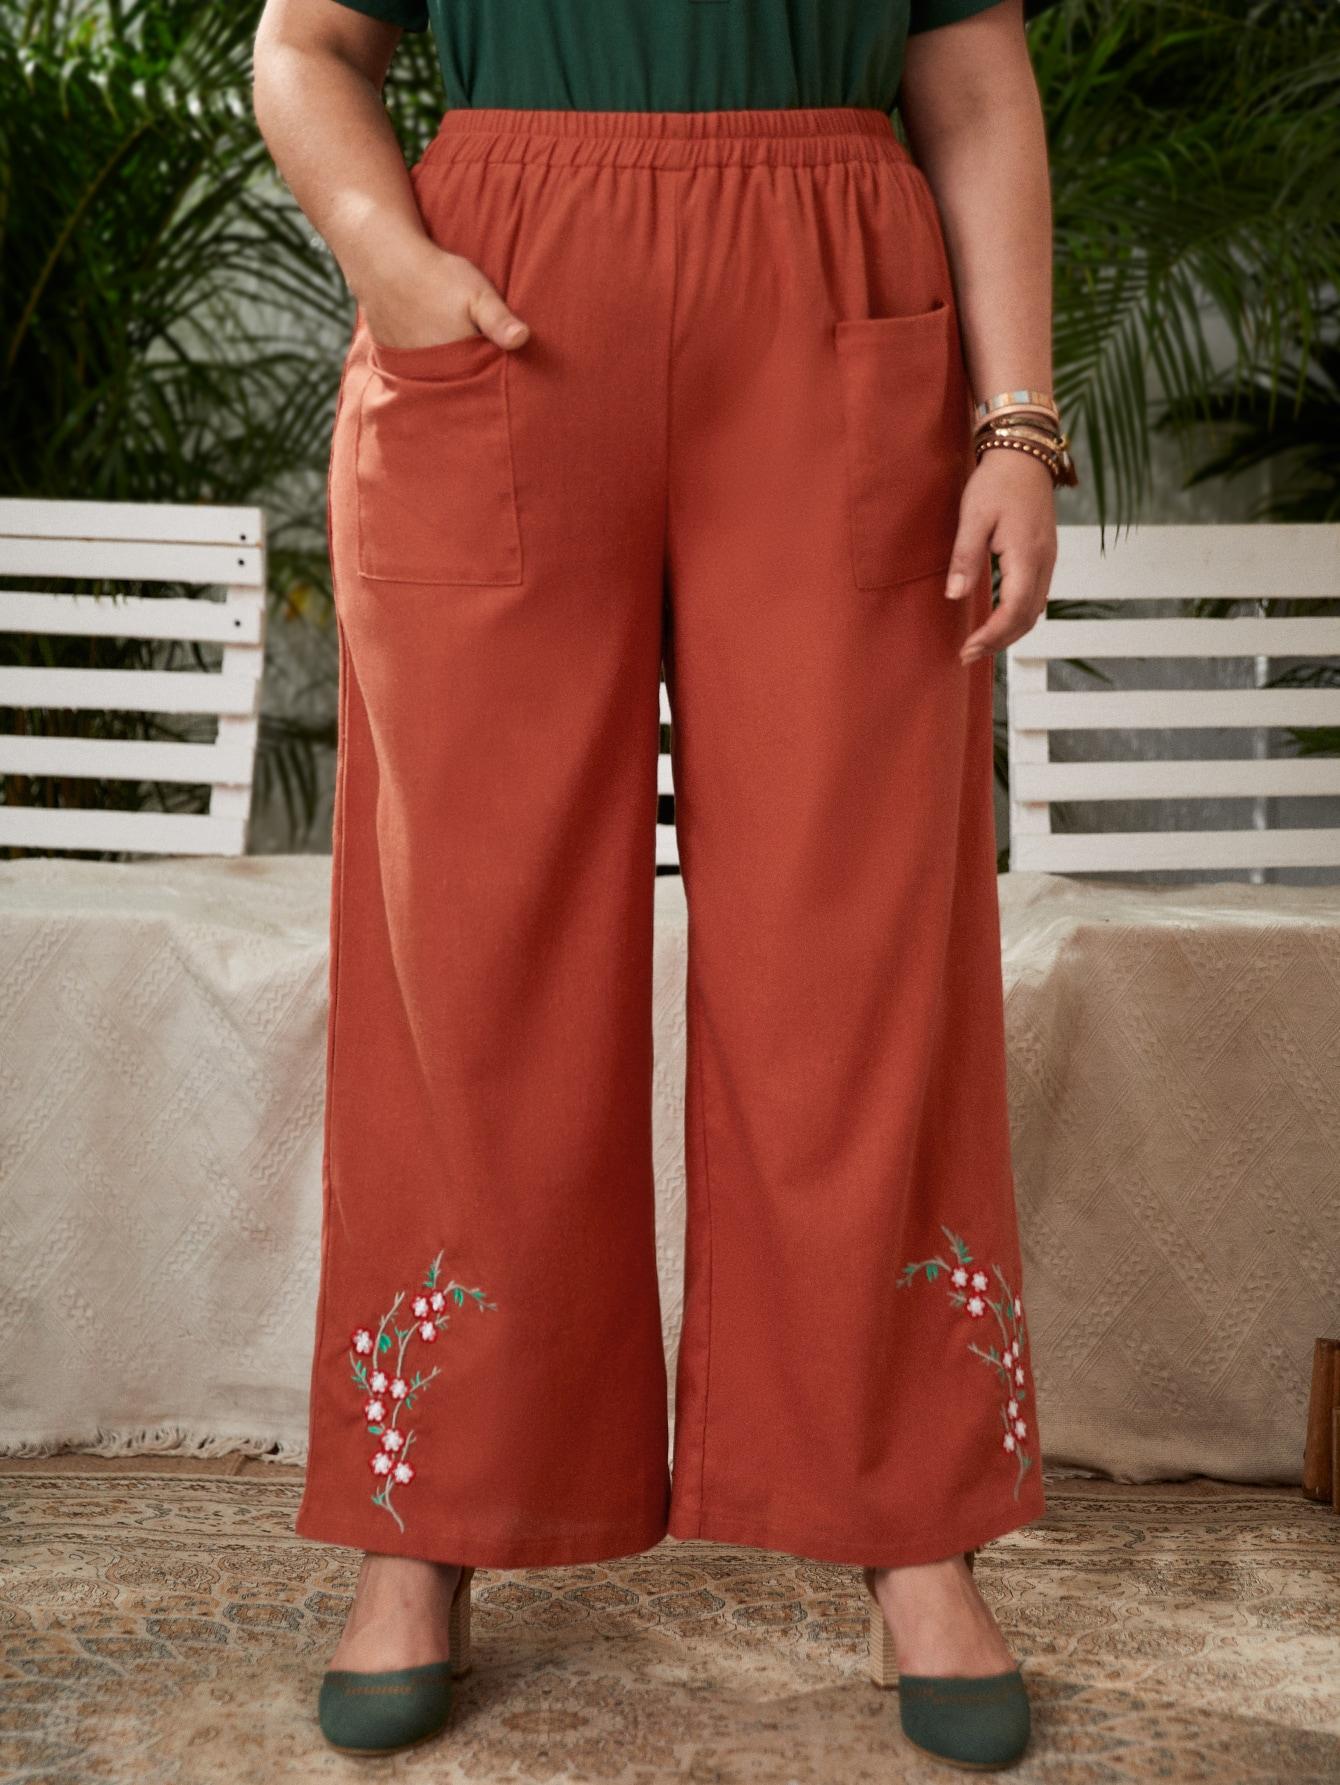 Plus Dual Pockets Floral Embroidery Wide Leg Pants